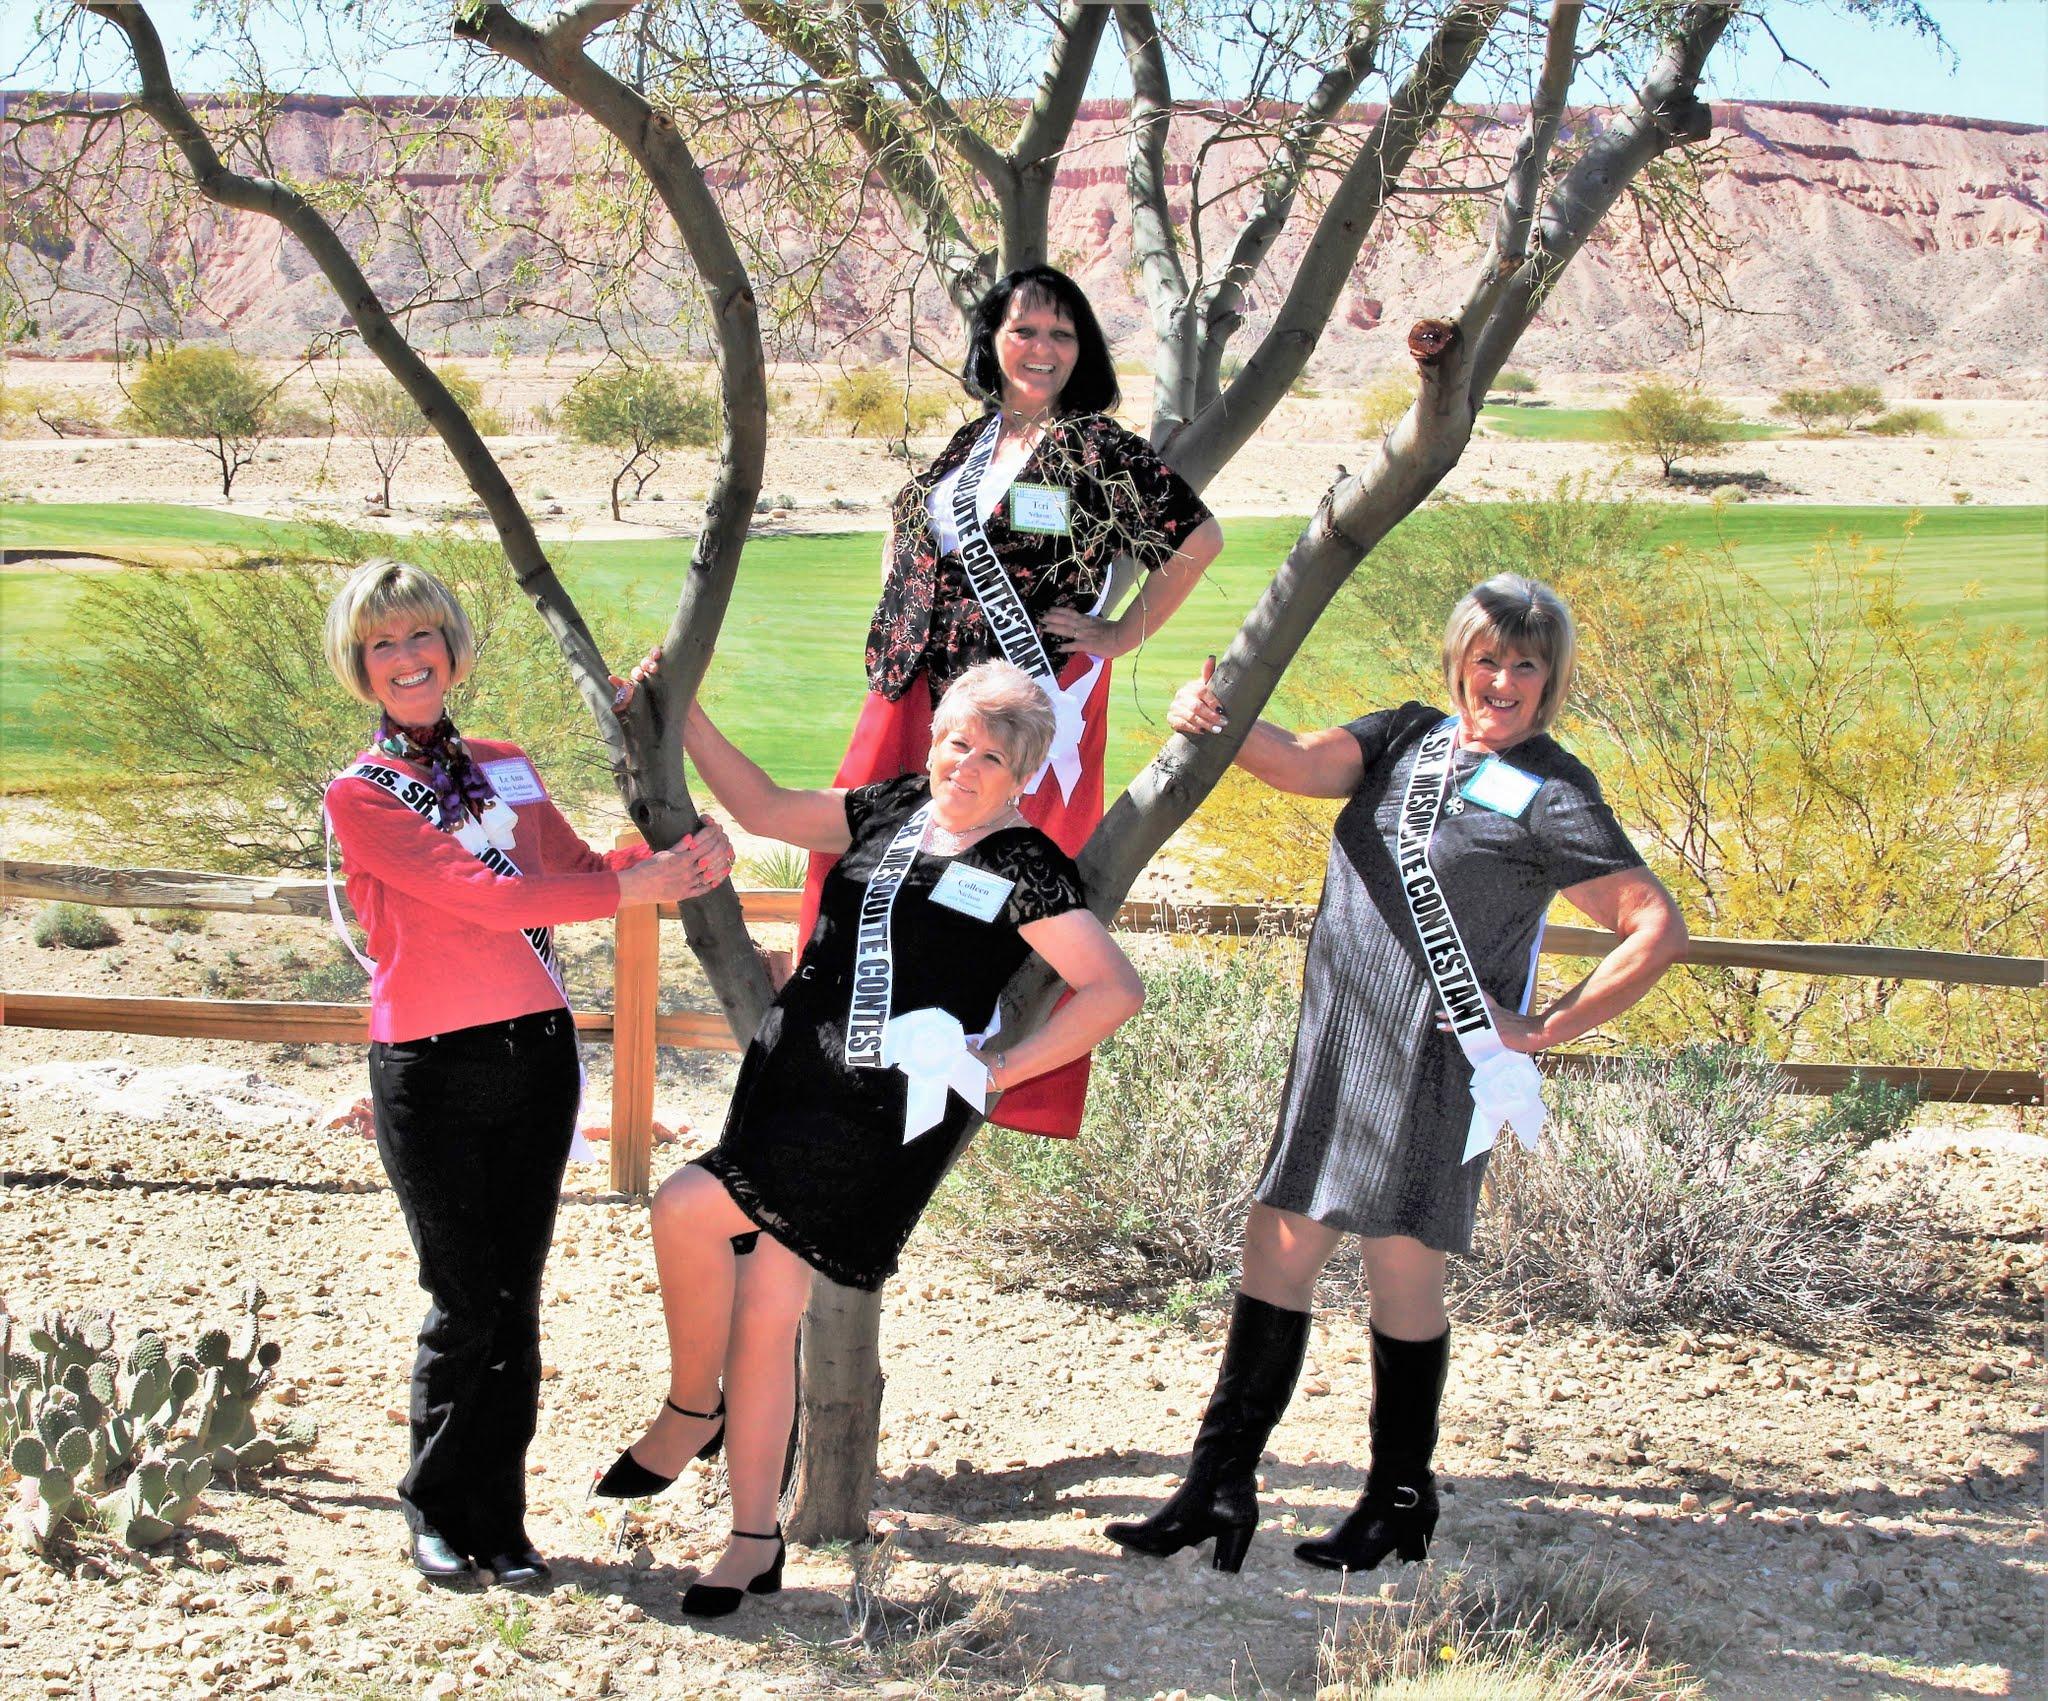 Meet the 2018 Ms. Senior Mesquite Contestants